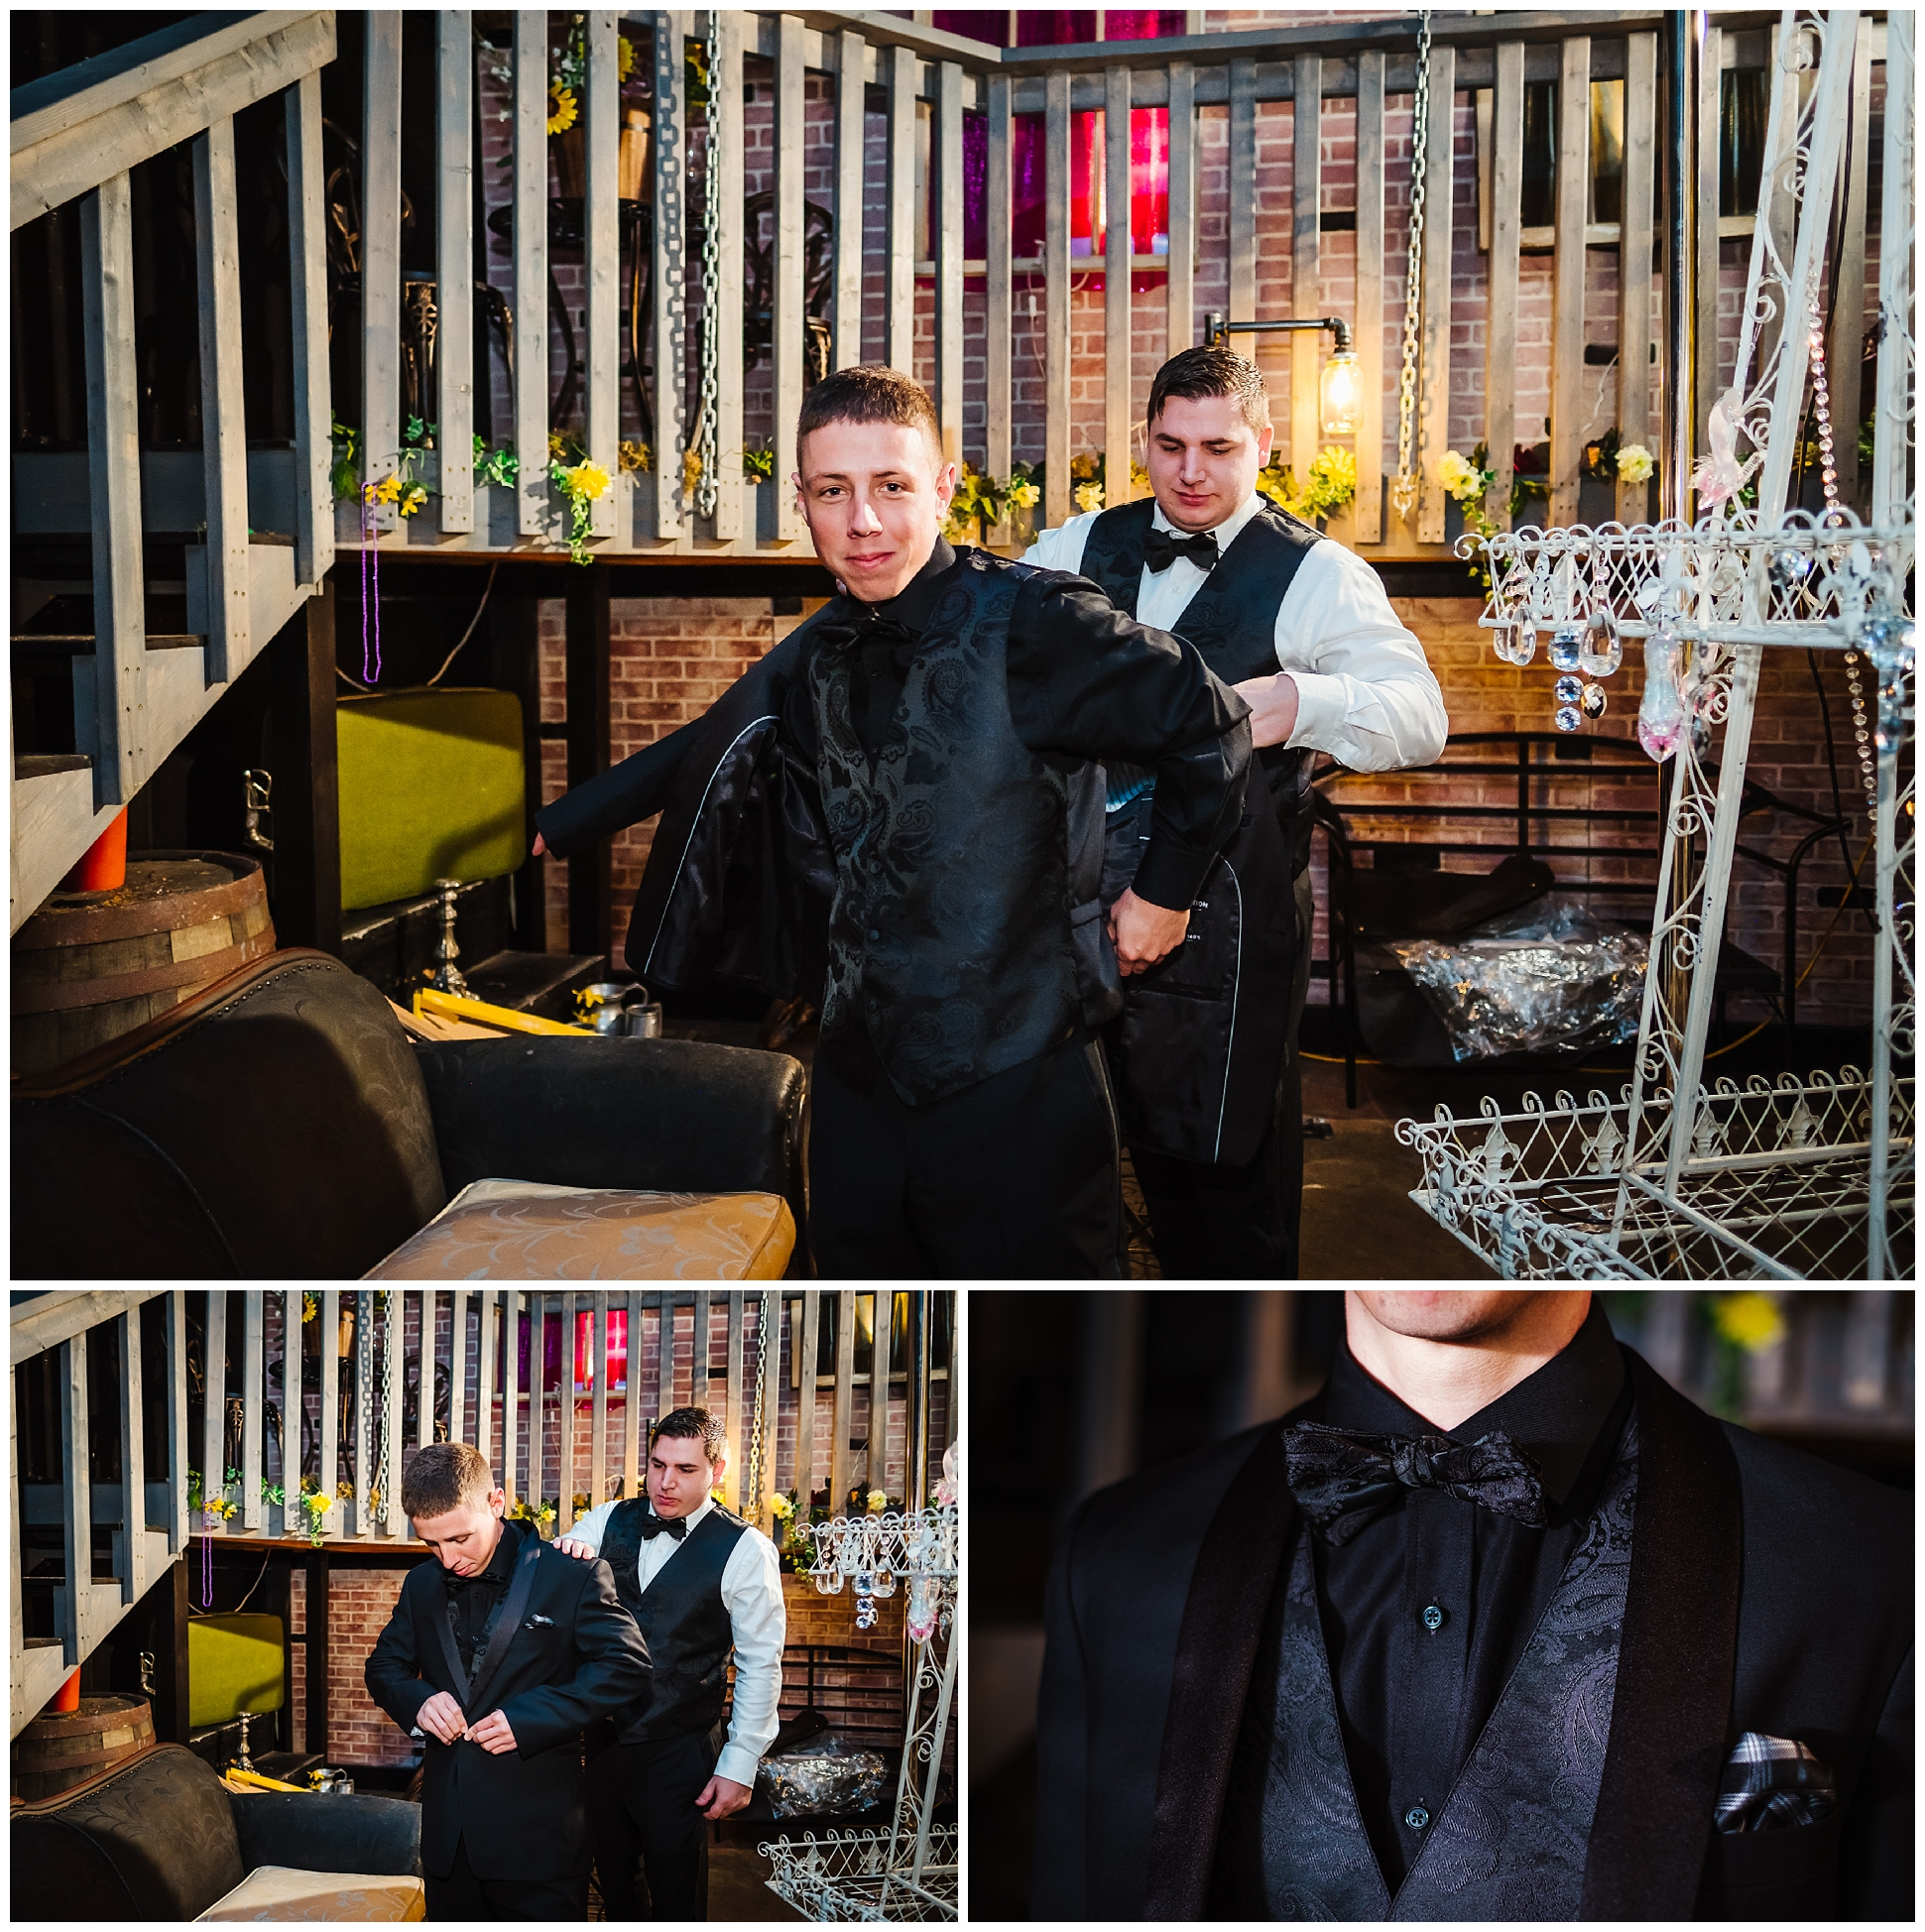 tampa-wedding-photographer-unique-indoor-venue_0005.jpg